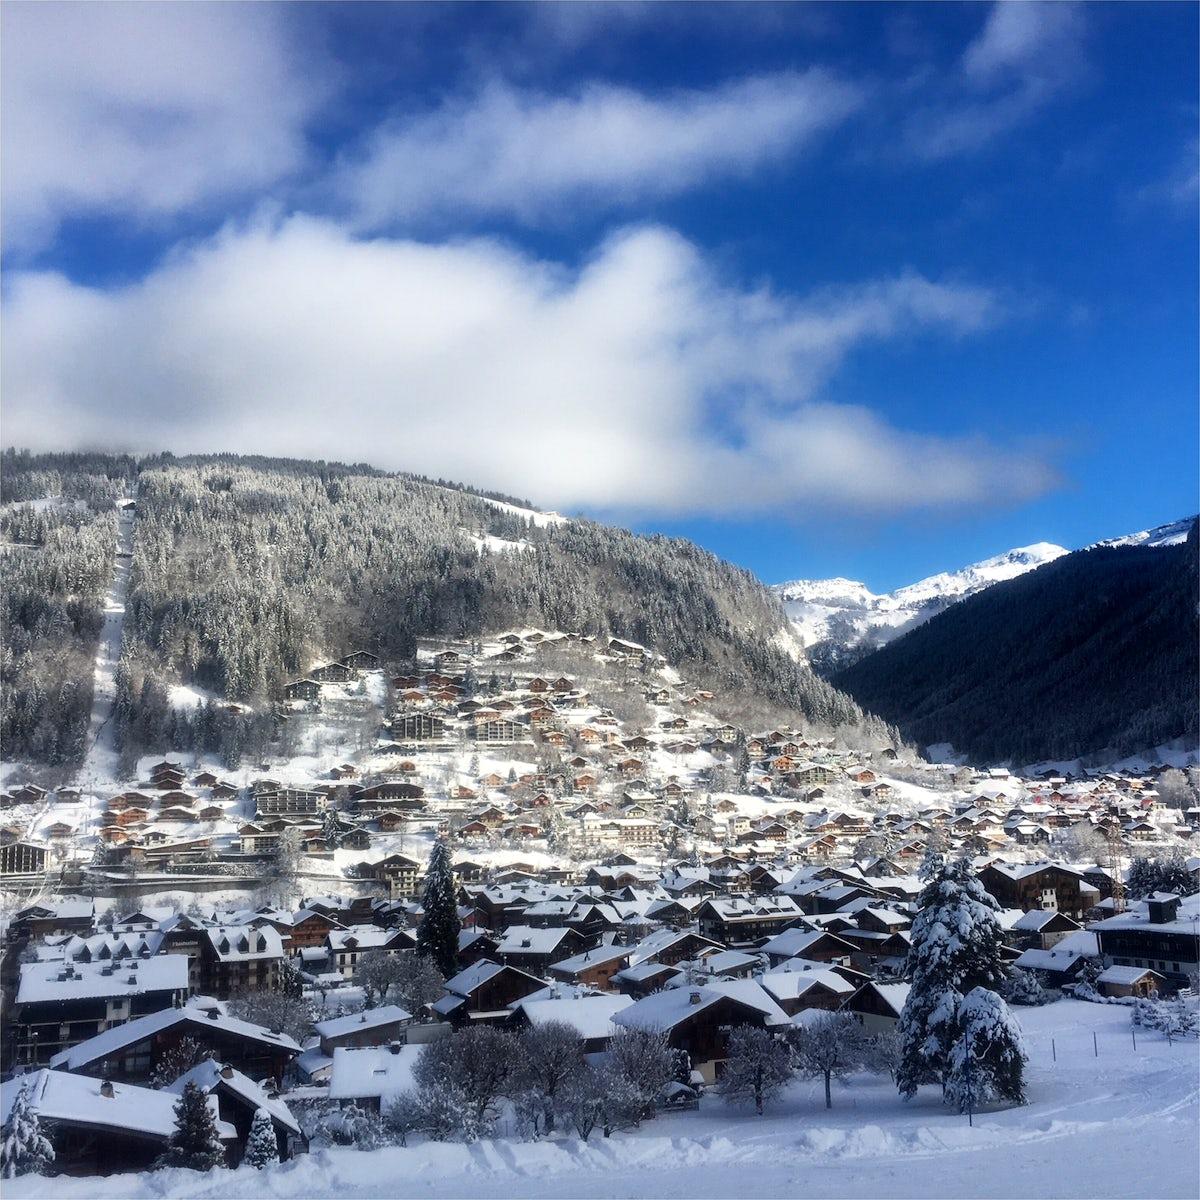 Les Portes de Soleil - Ski, Walk and Eat in the Alps